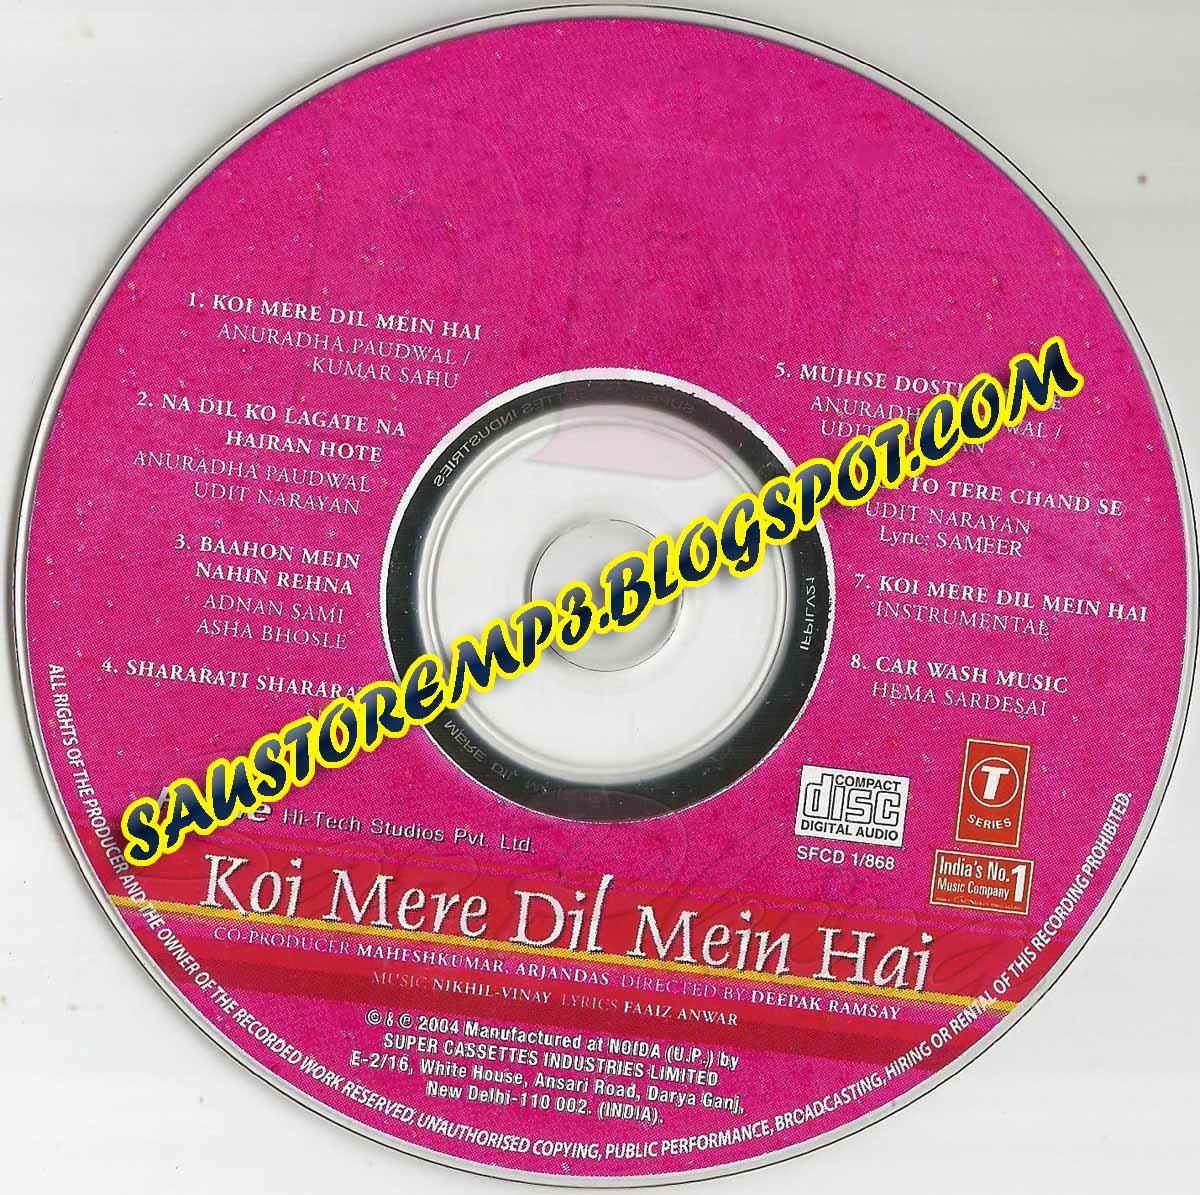 Koi Puche Mere Dil Se Song Mp3: Www.saustoremp3.blogspot.com: Anuradha Paudwal